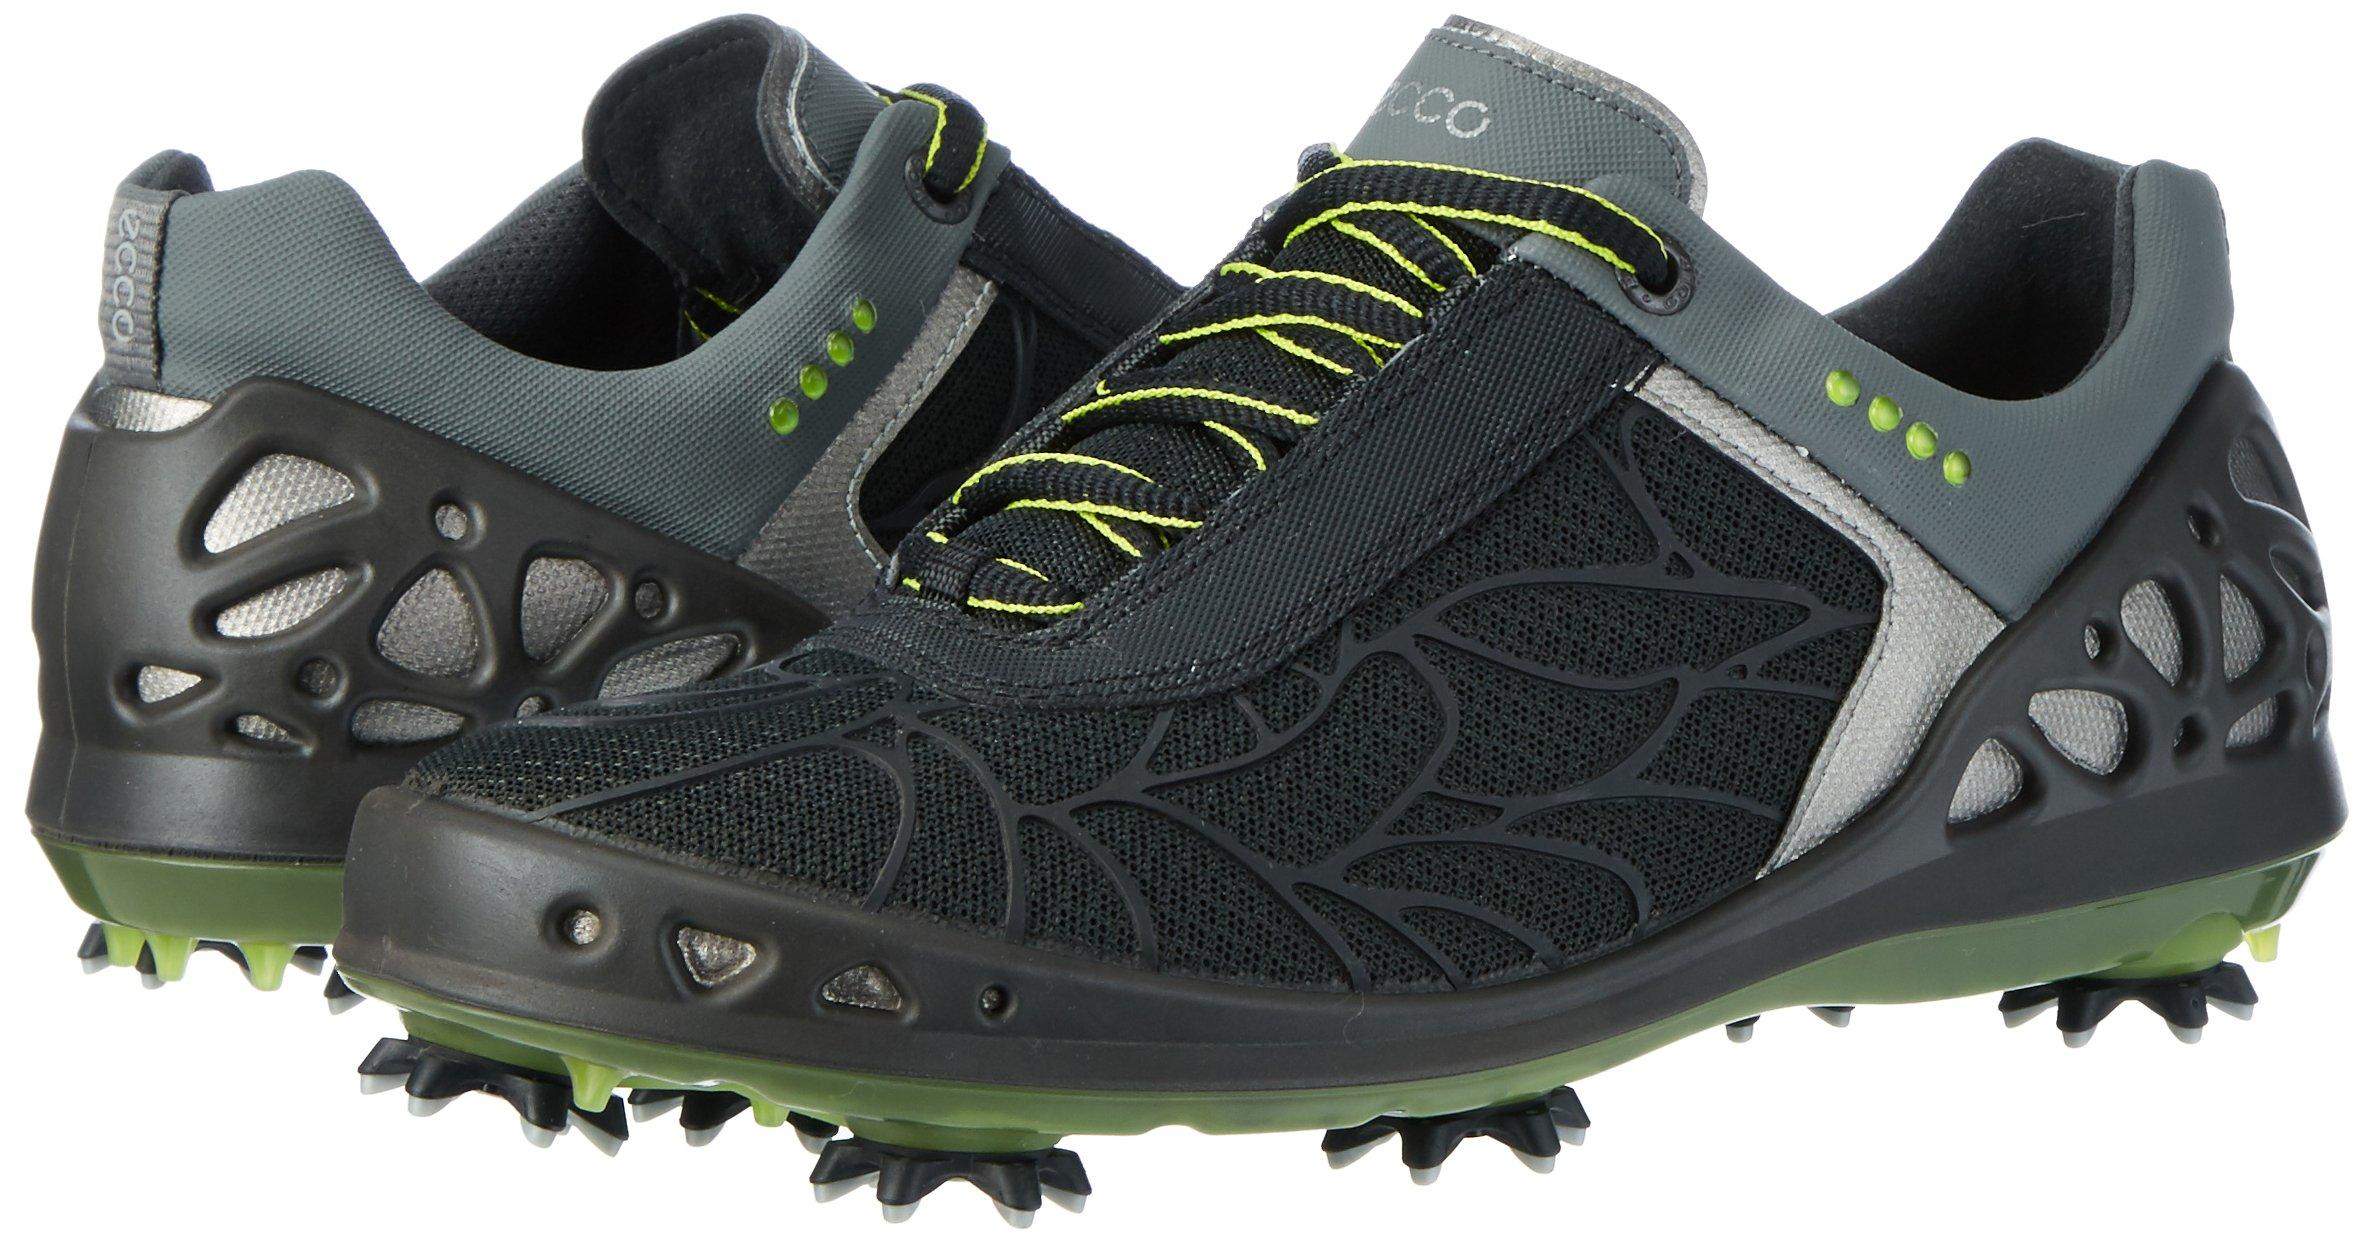 ECCO Women's Cage Evo Golf Shoe, Black, 41 EU/10-10.5 M US by ECCO (Image #5)